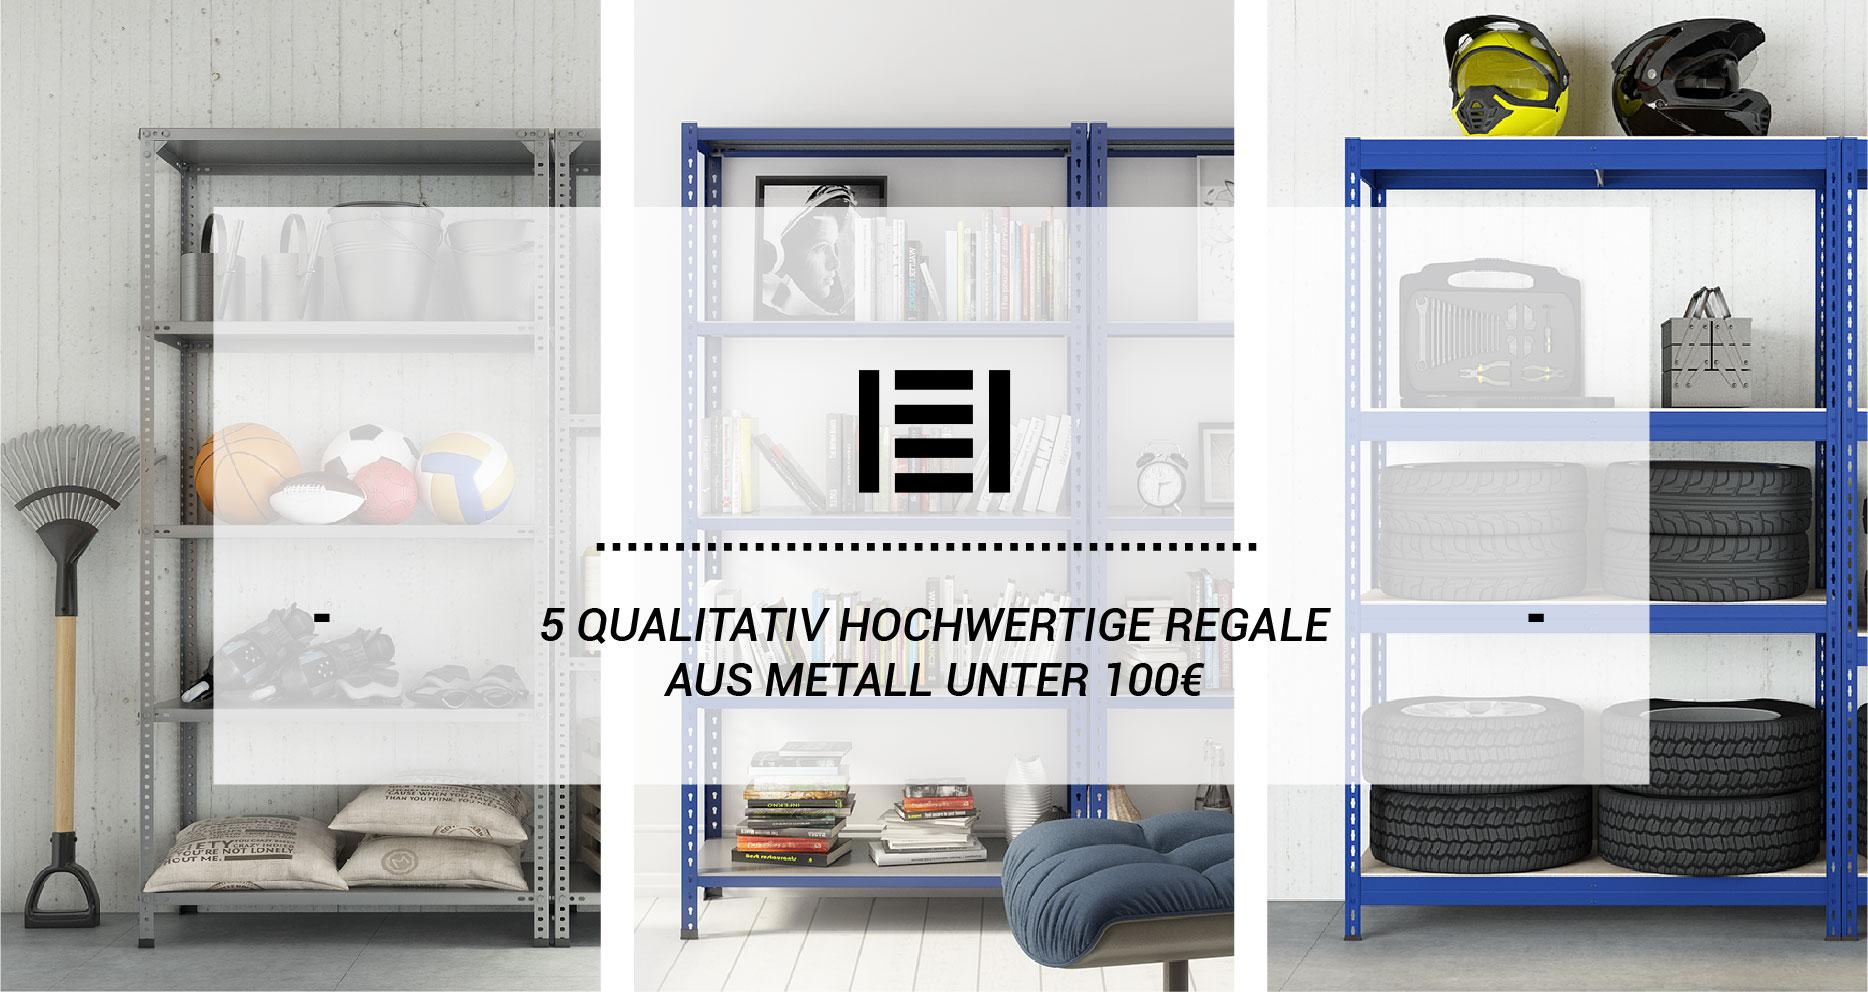 5 qualitativ hochwertige Regale aus Metall unter 100€